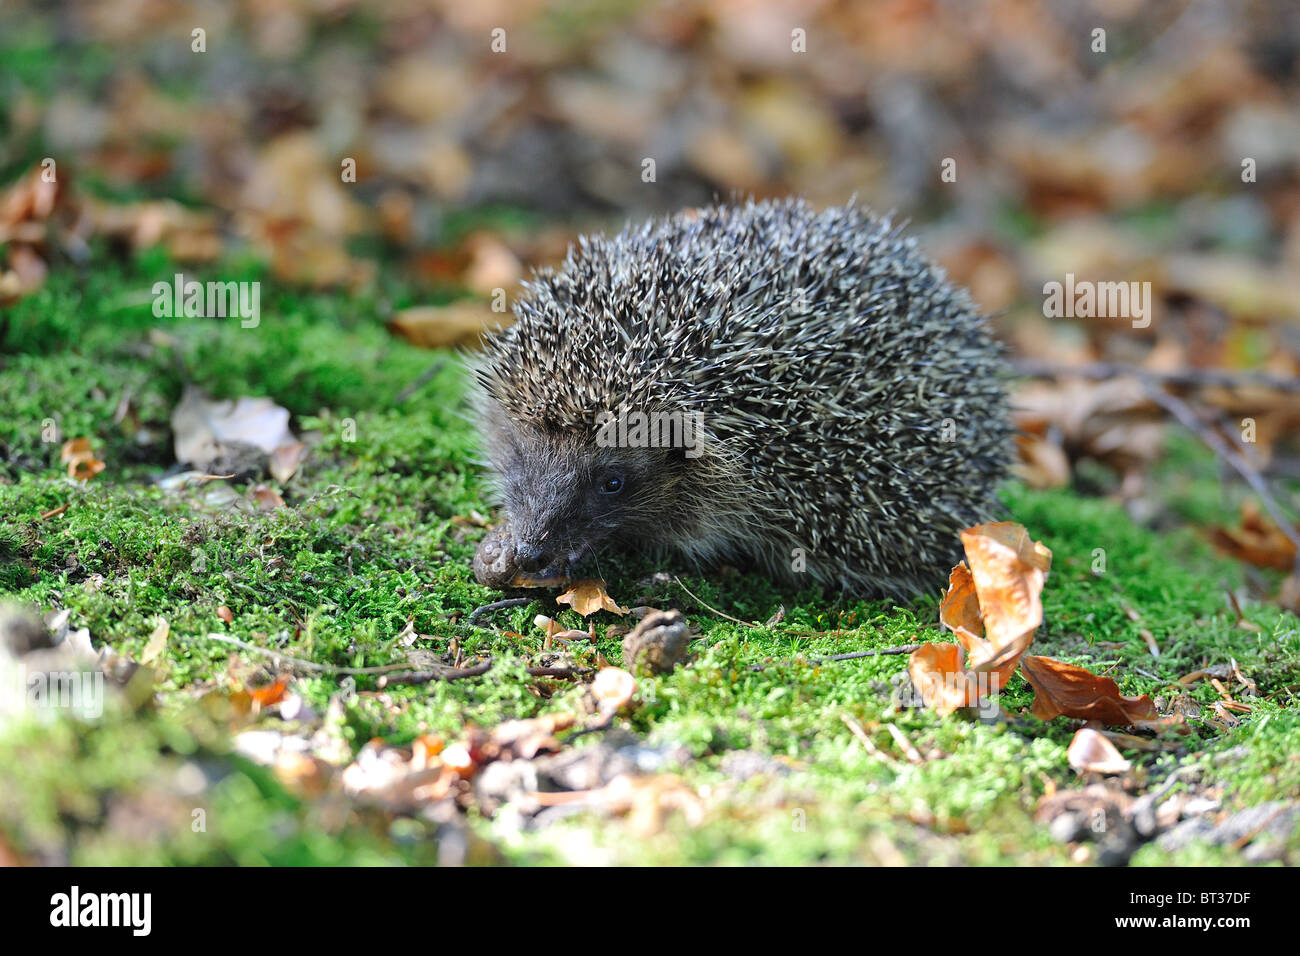 Western European hedgehog (Erinaceus europaeus) eating a snail - Stock Image